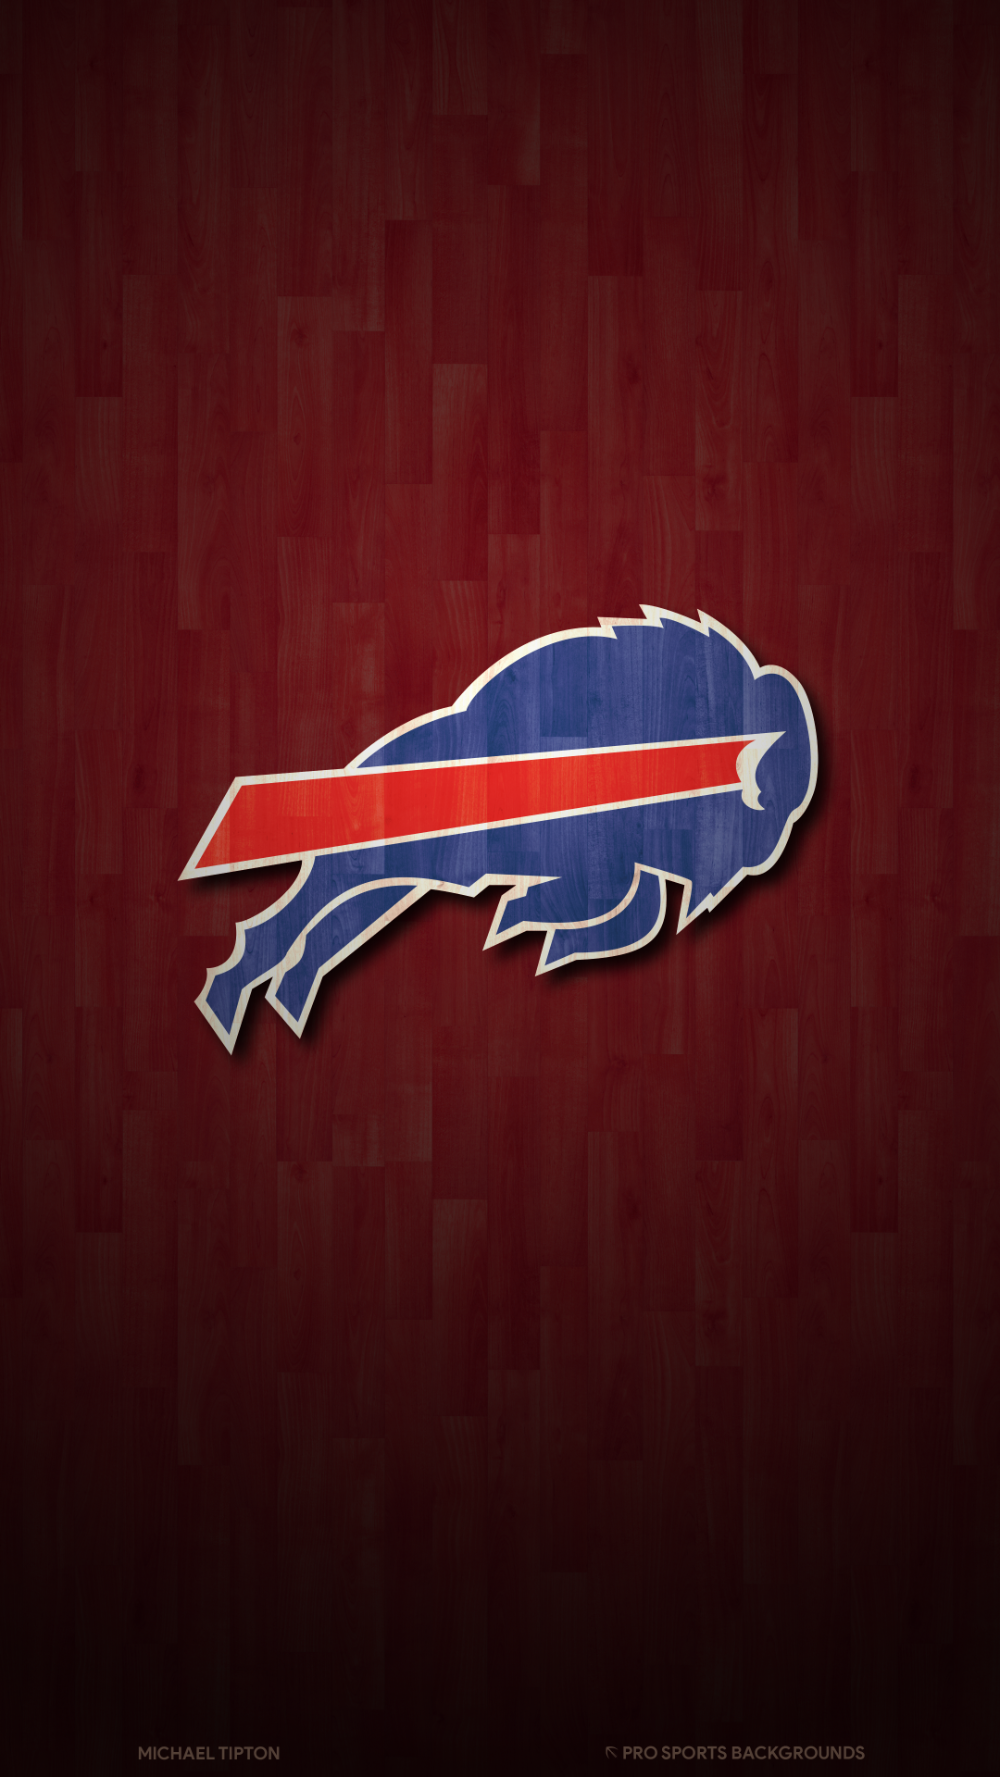 2019 Buffalo Bills Wallpapers Pro Sports Backgrounds Buffalo Bills Logo Buffalo Bills Nfl Buffalo Bills